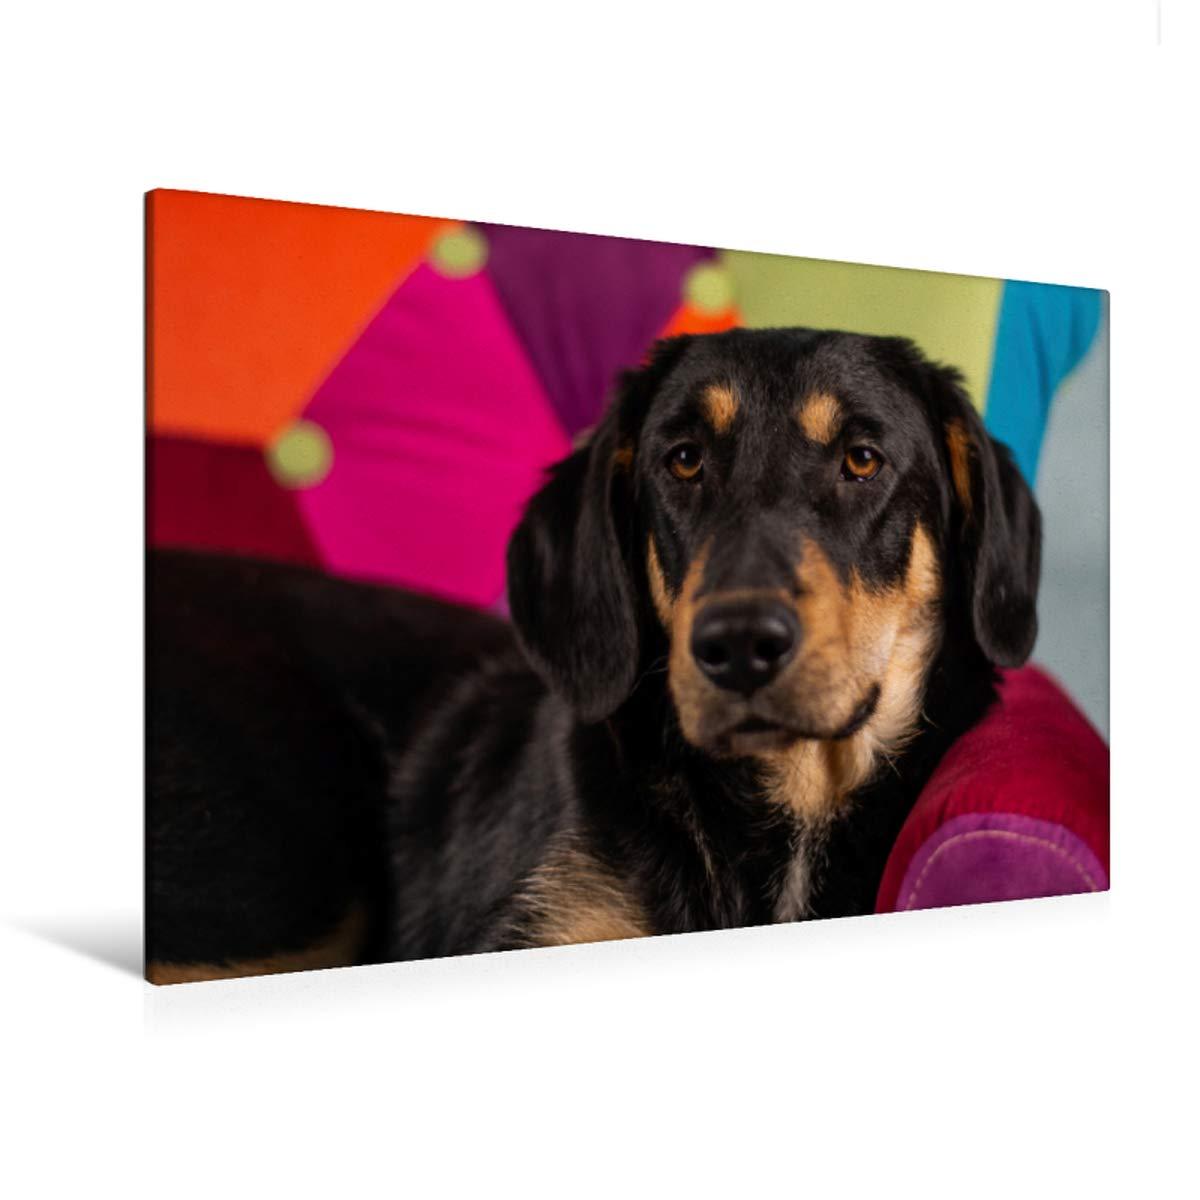 120 x 80 Premium Textile Canvas 90 x 60 cm Horizontal Dog View